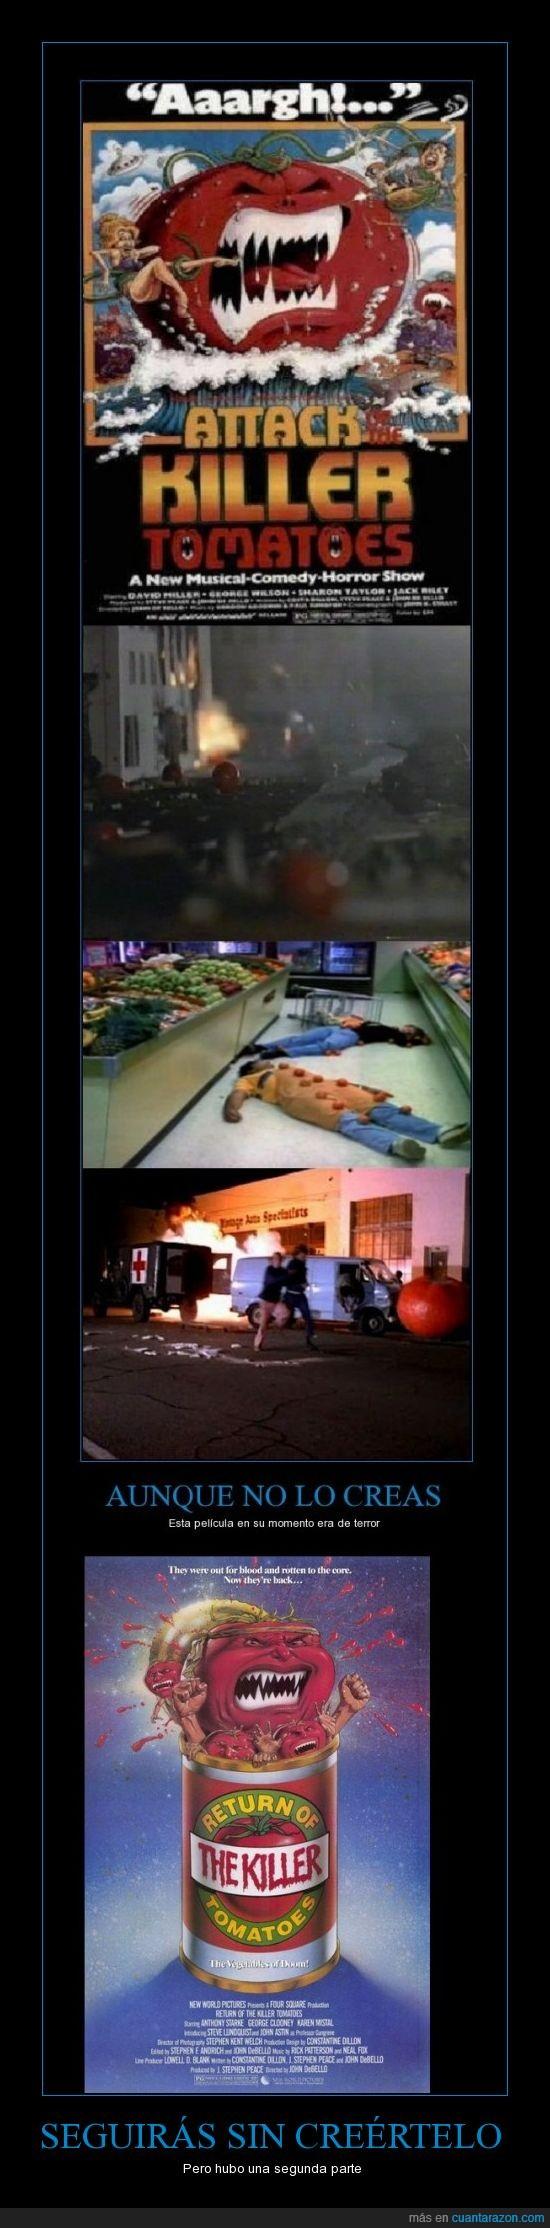 asesinos,pelicula,tomates